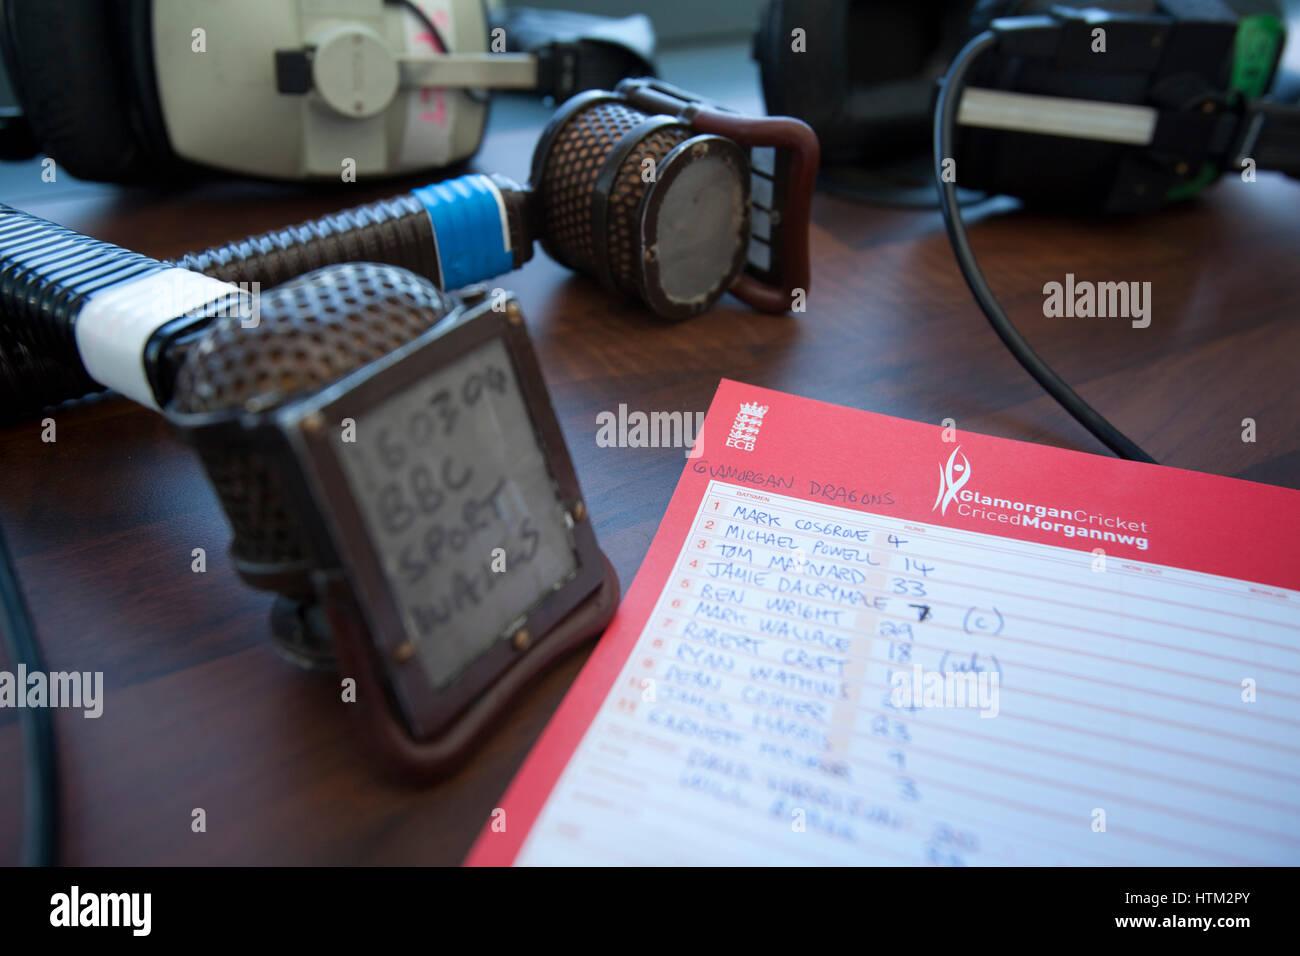 Commentator mic at Glamorgan County Cricket Club, Wales, United Kingdom - Stock Image